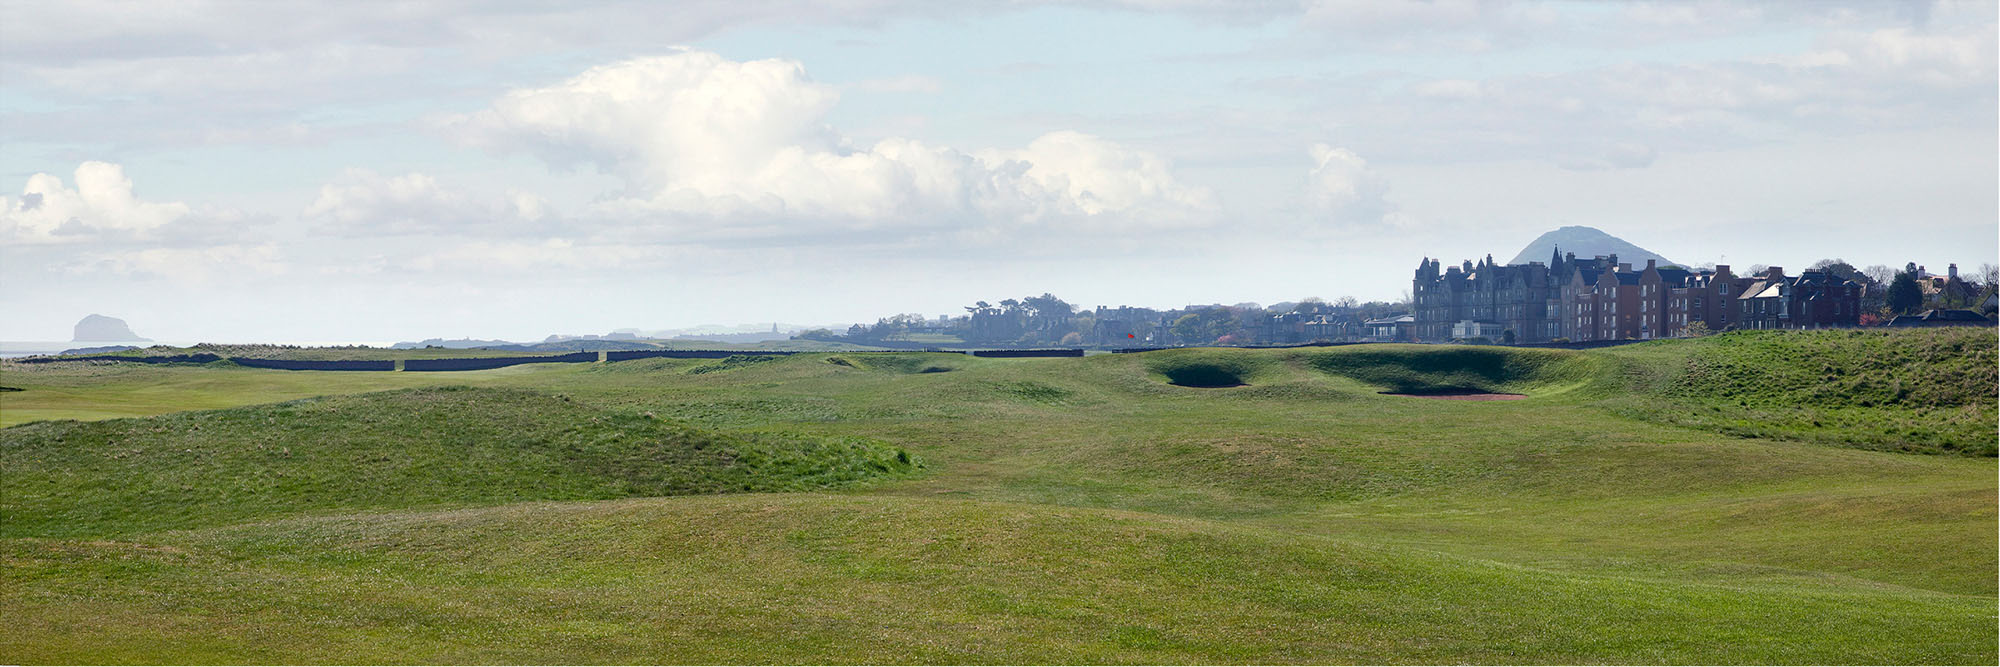 Golf Course Image - North Berwick Golf Club No. 15